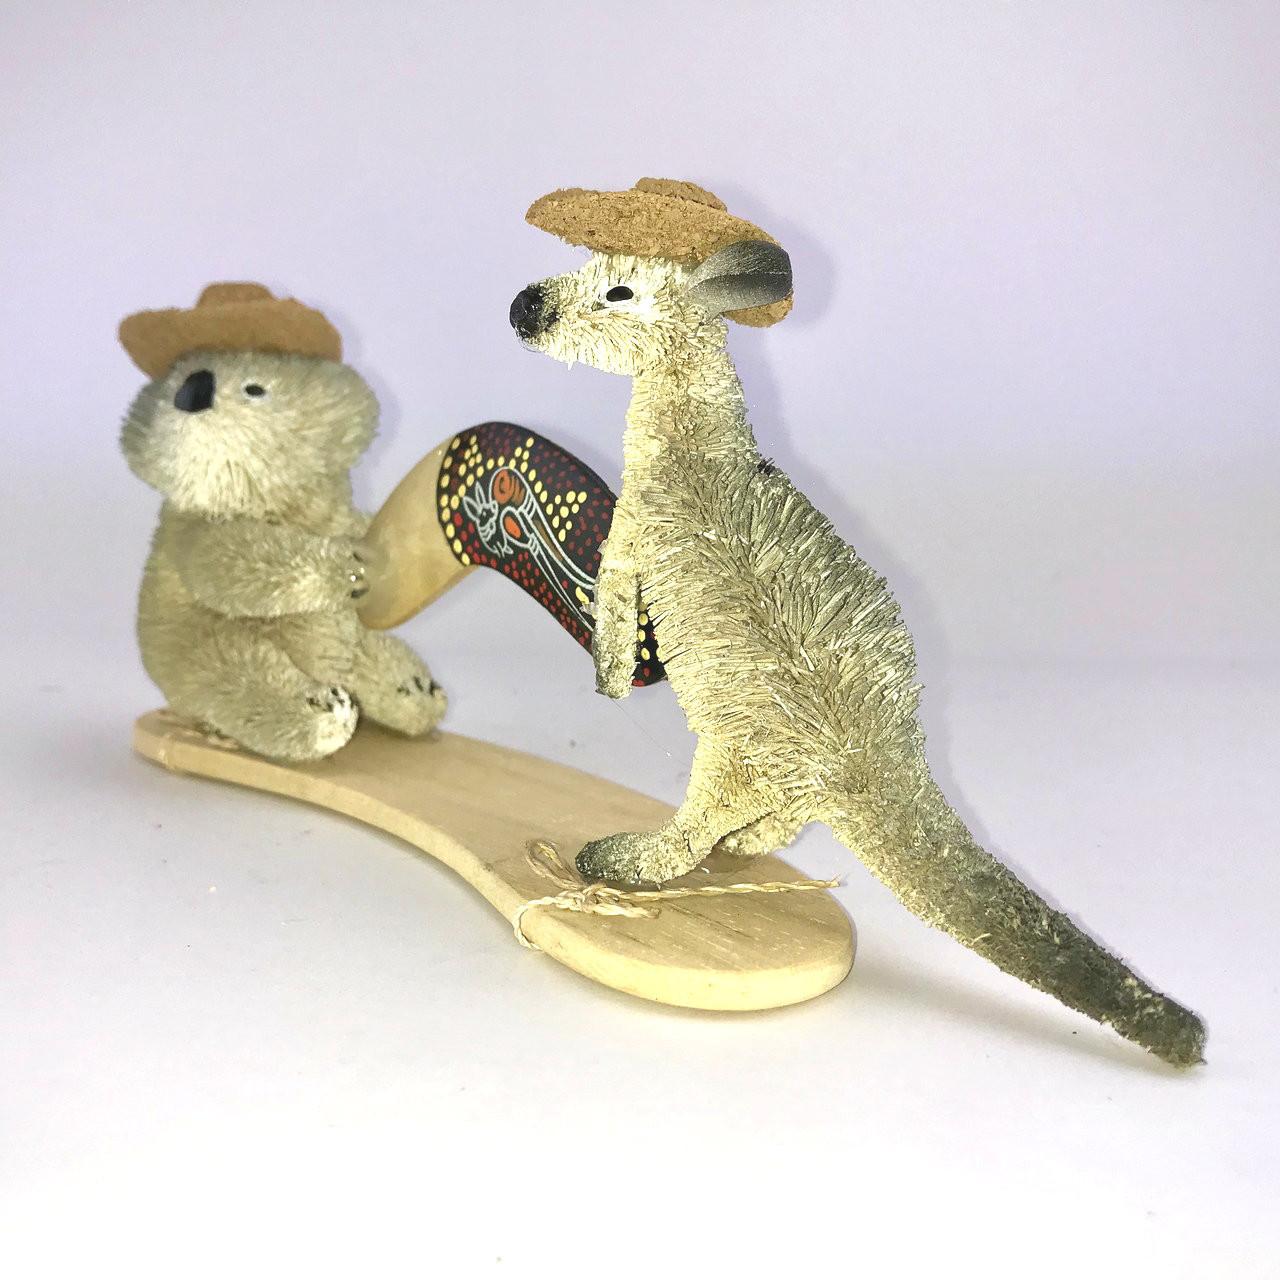 Kangaroo and Koala with Boomerang